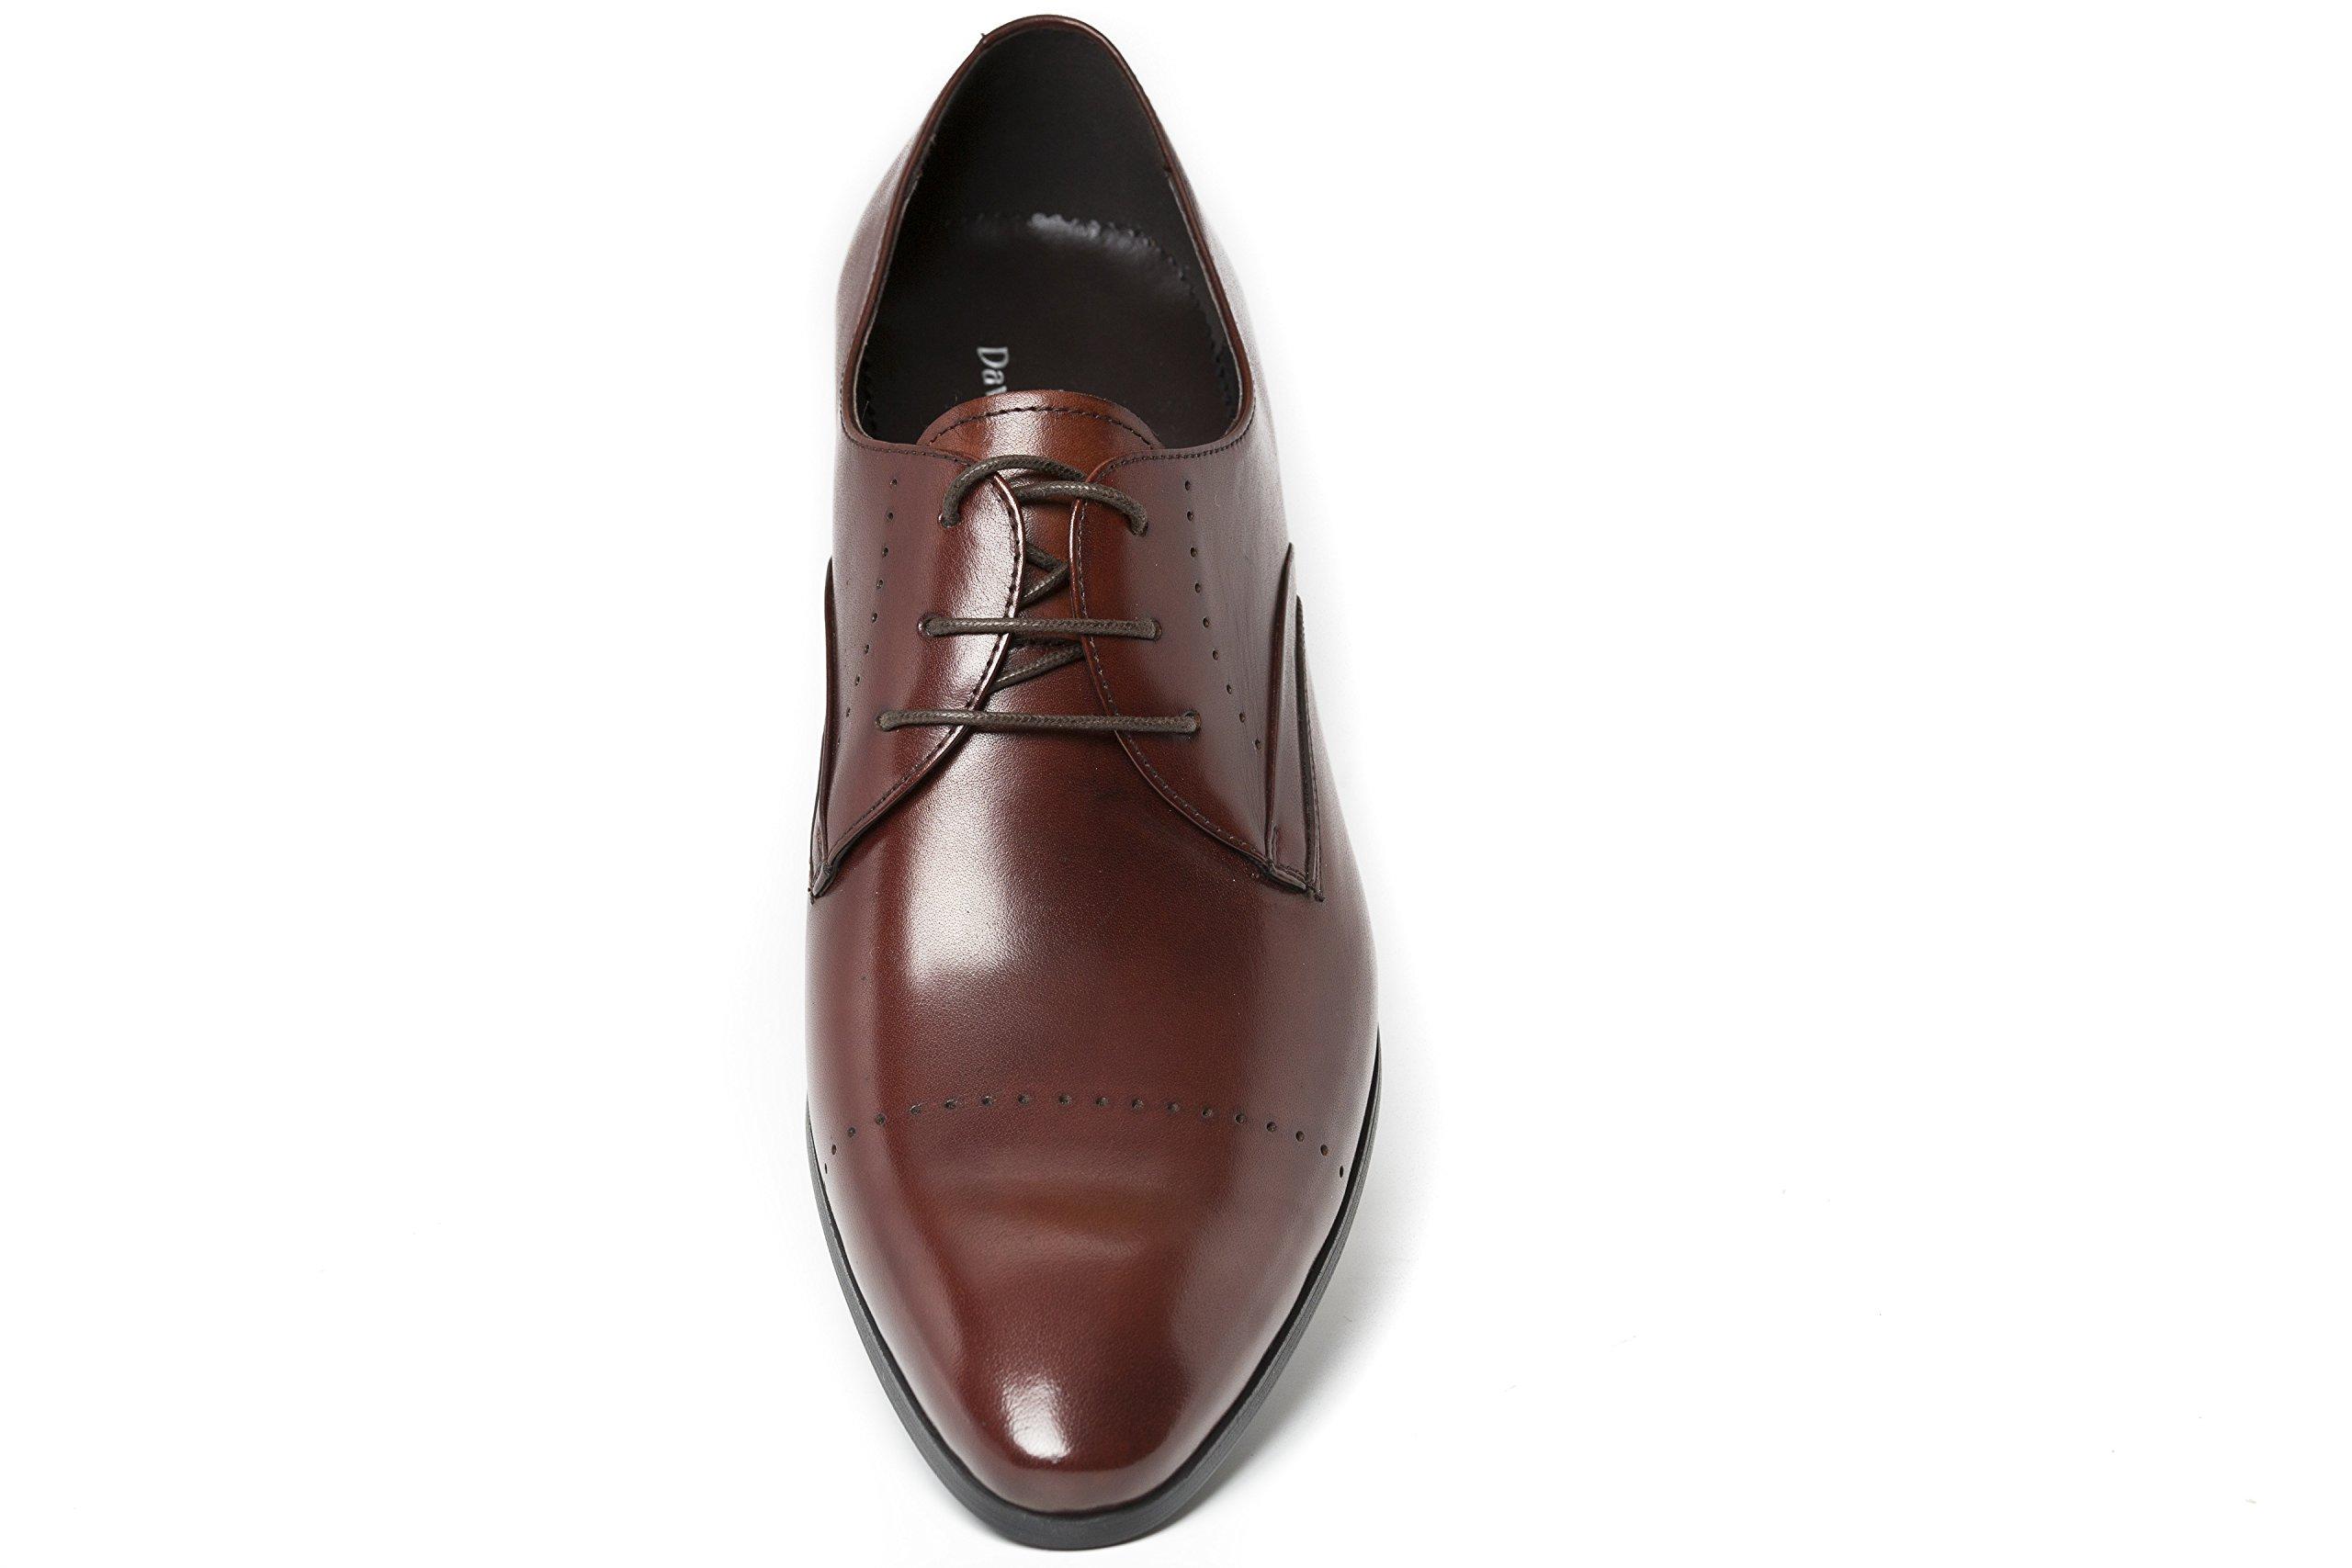 Phoenix (Liam Michael Family of Shoes) (9, Brown) by Liam Michael Shoes